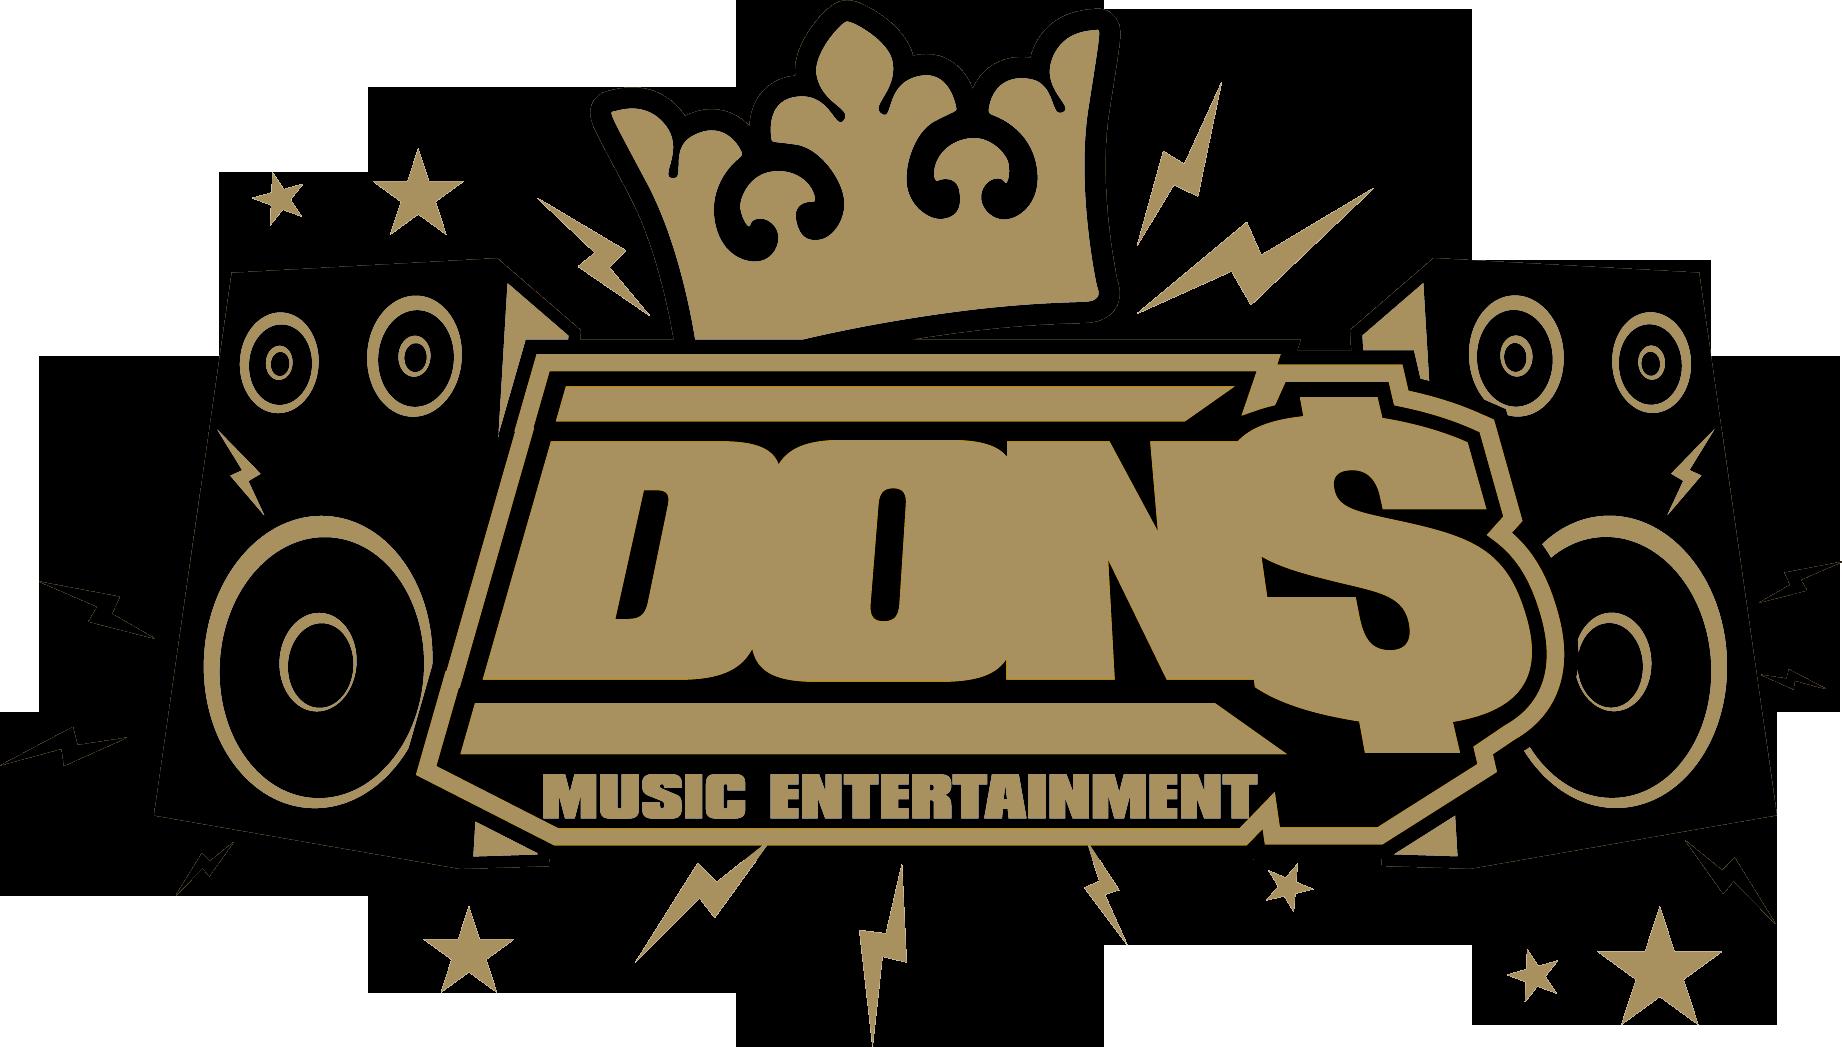 logo don's music